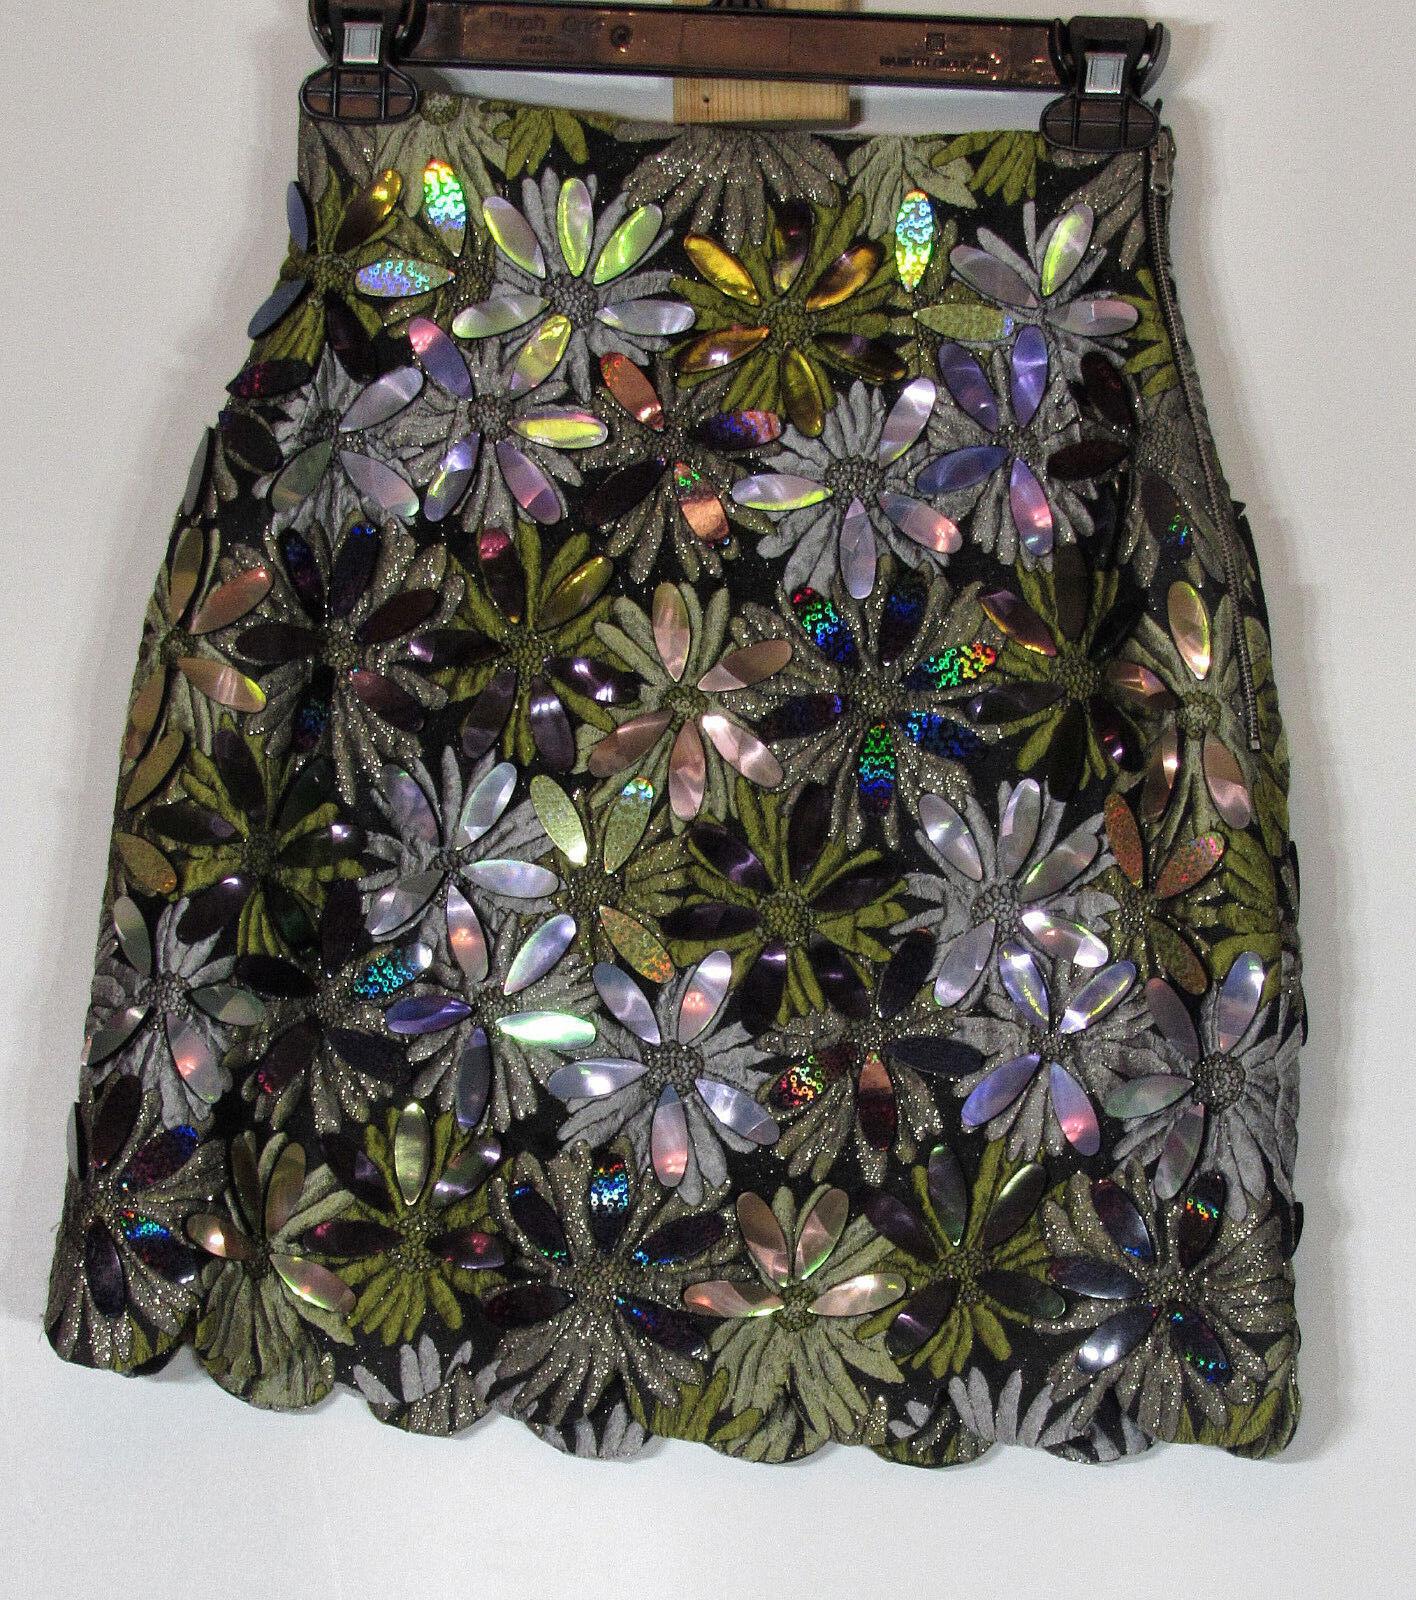 IPP Sequined Floral Glass Embellished Miniskirt, Scalloped hem, Women Size 2